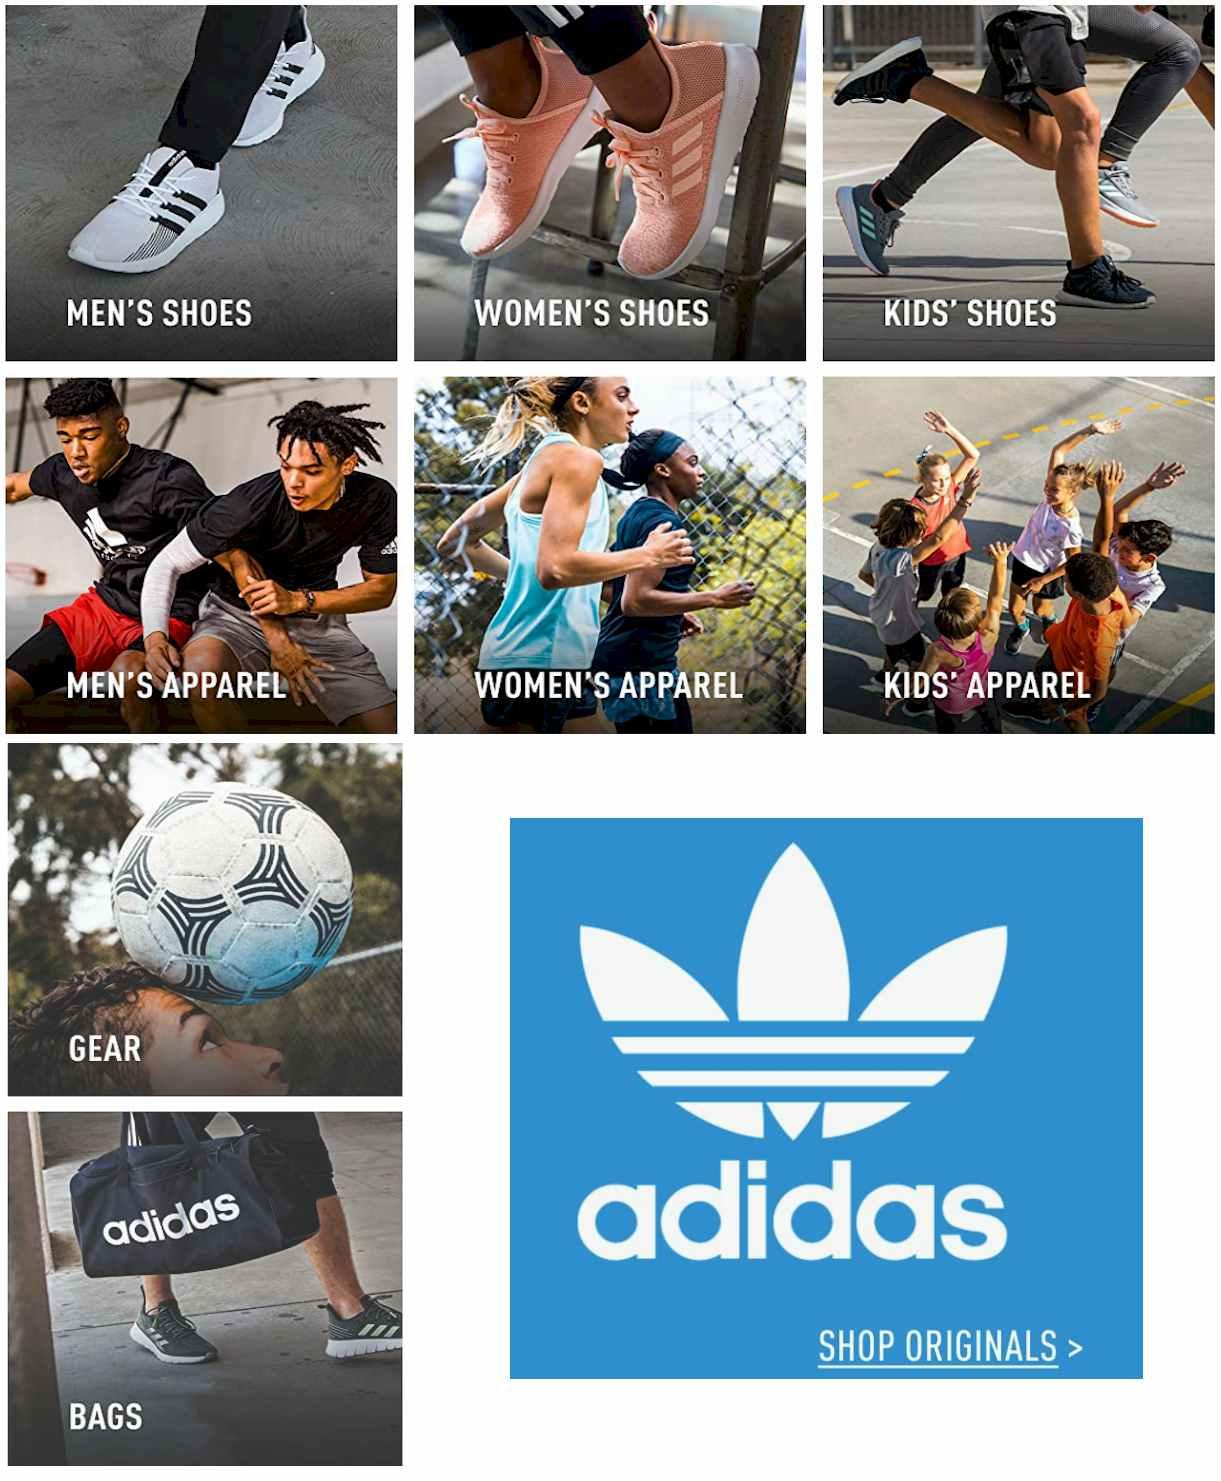 Adidas Store on Amazon